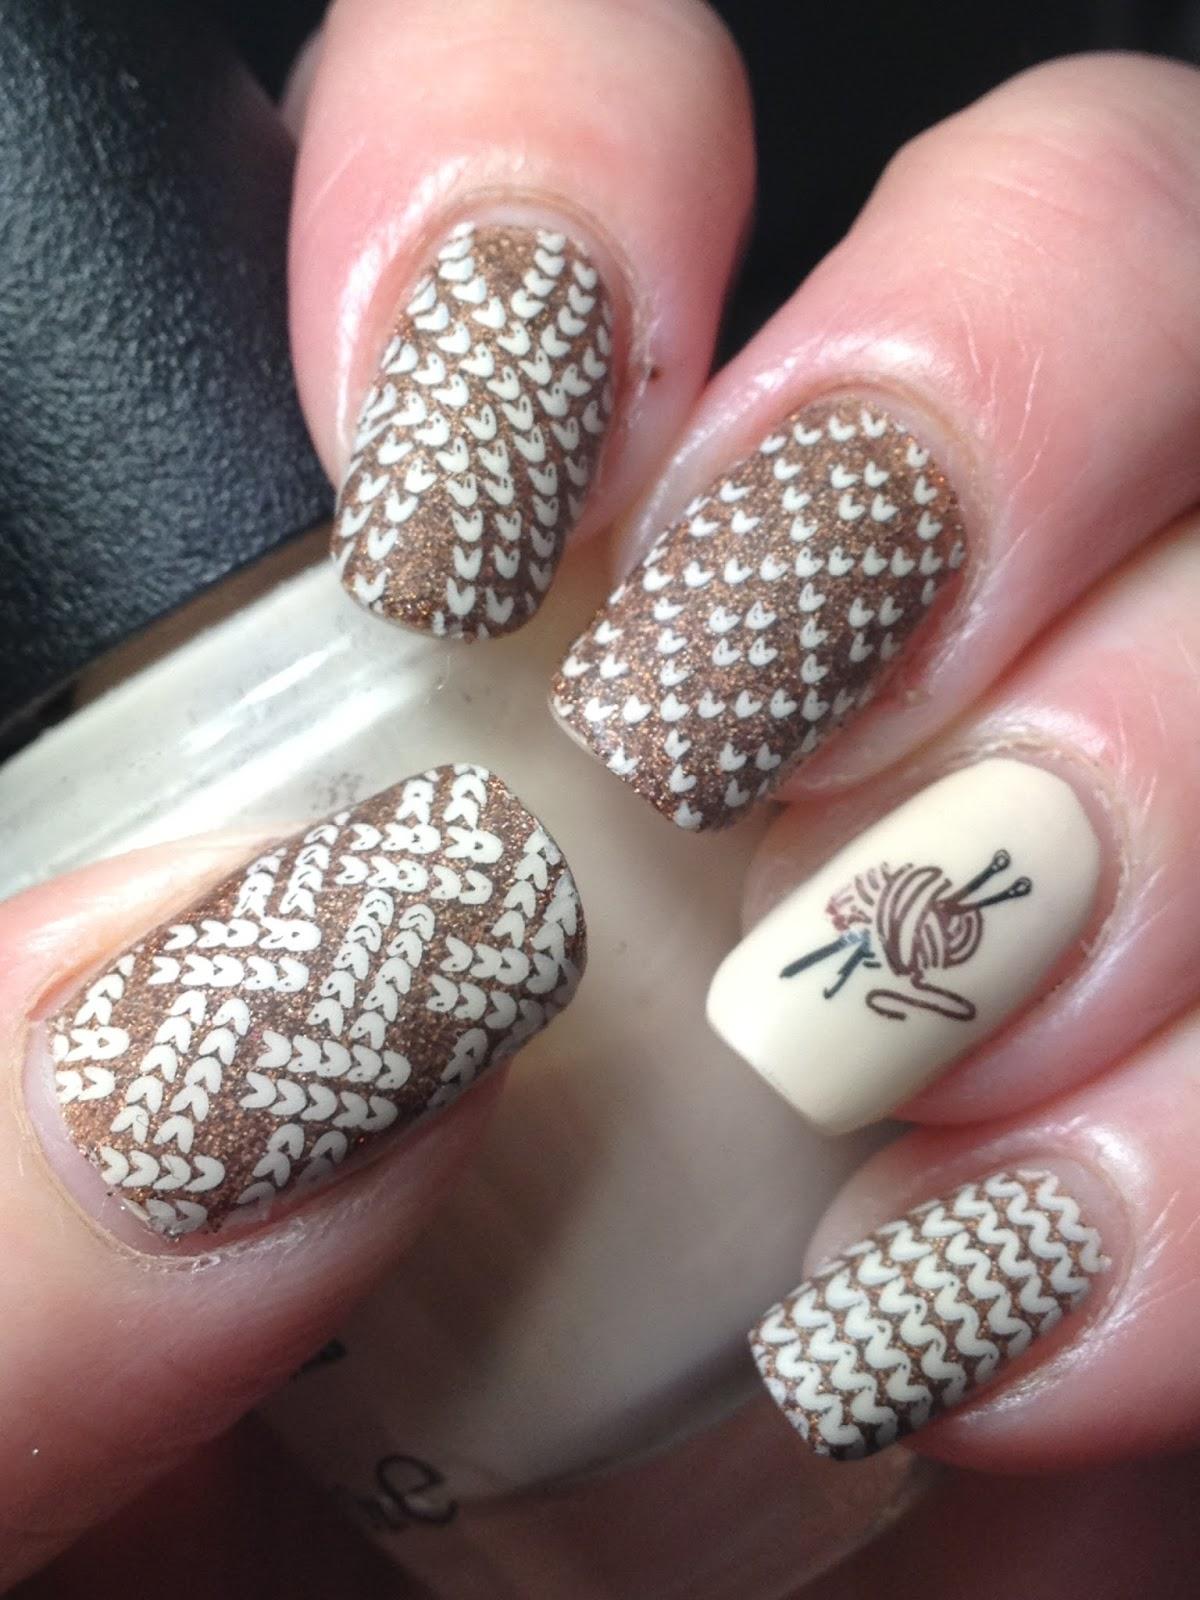 Canadian nail fanatic 40 great nail art ideas hobbies prinsesfo Choice Image